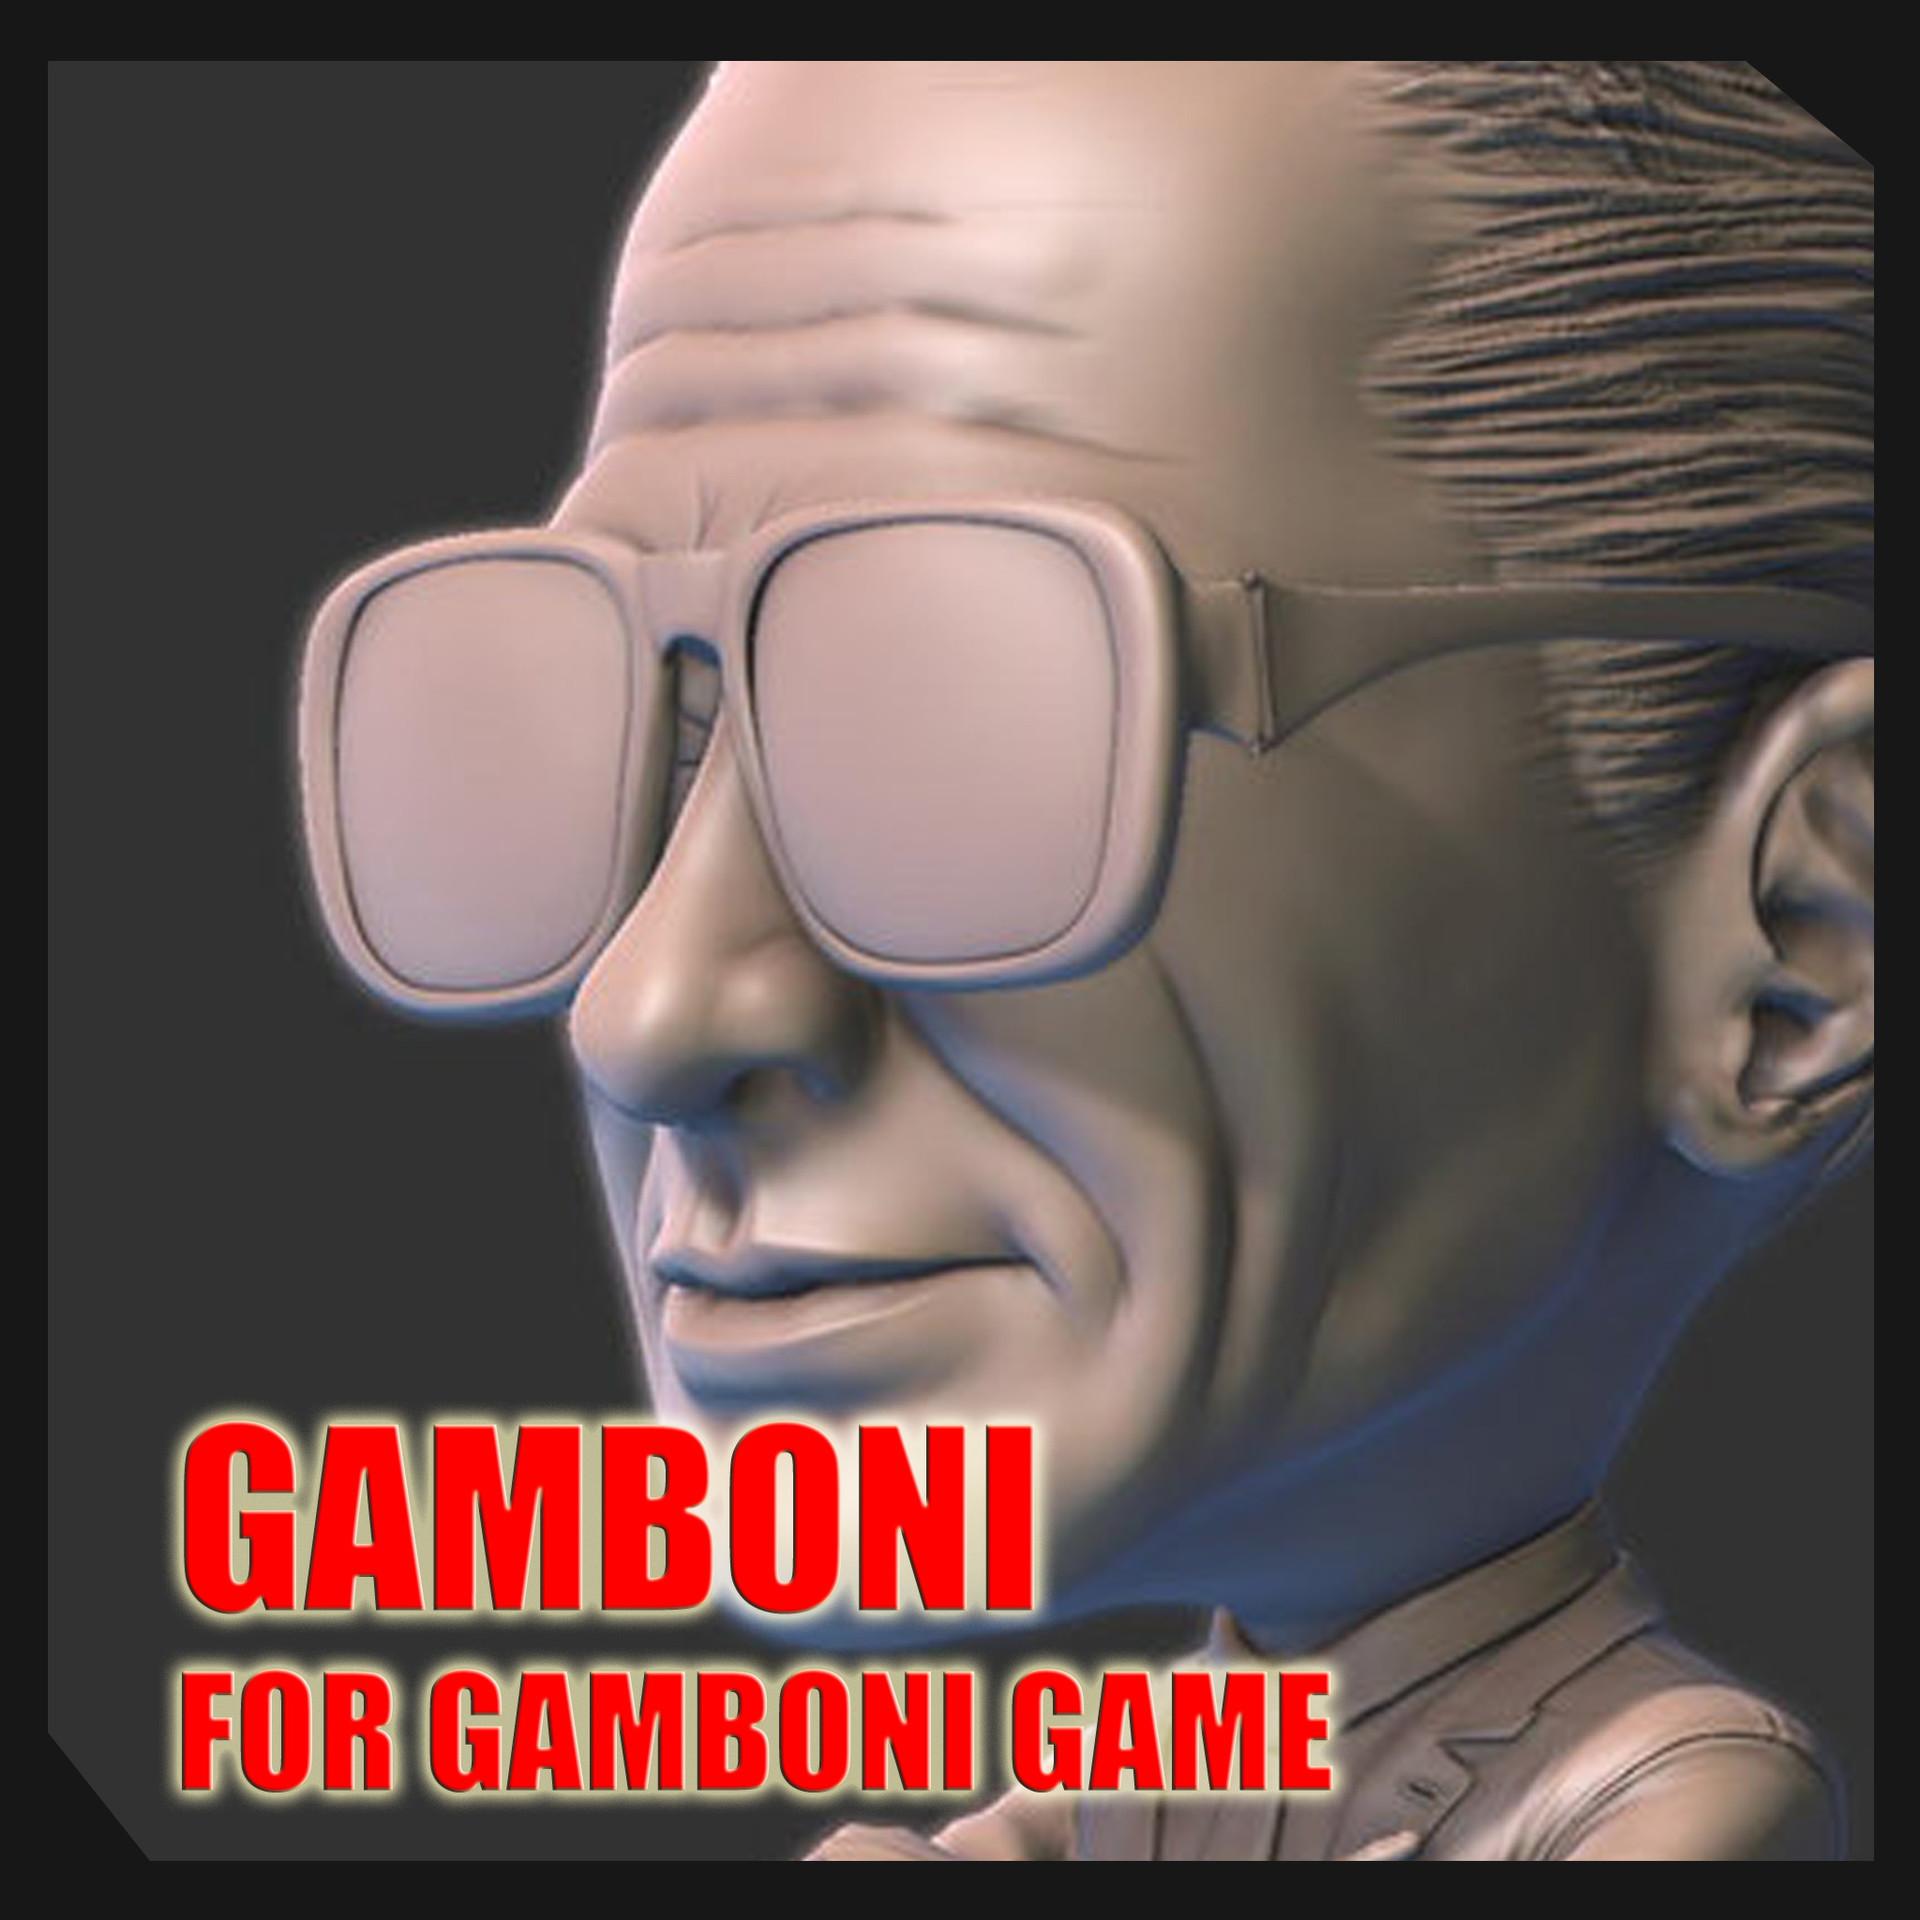 Gamboni for Gamboni Game. By Sergio Mengual